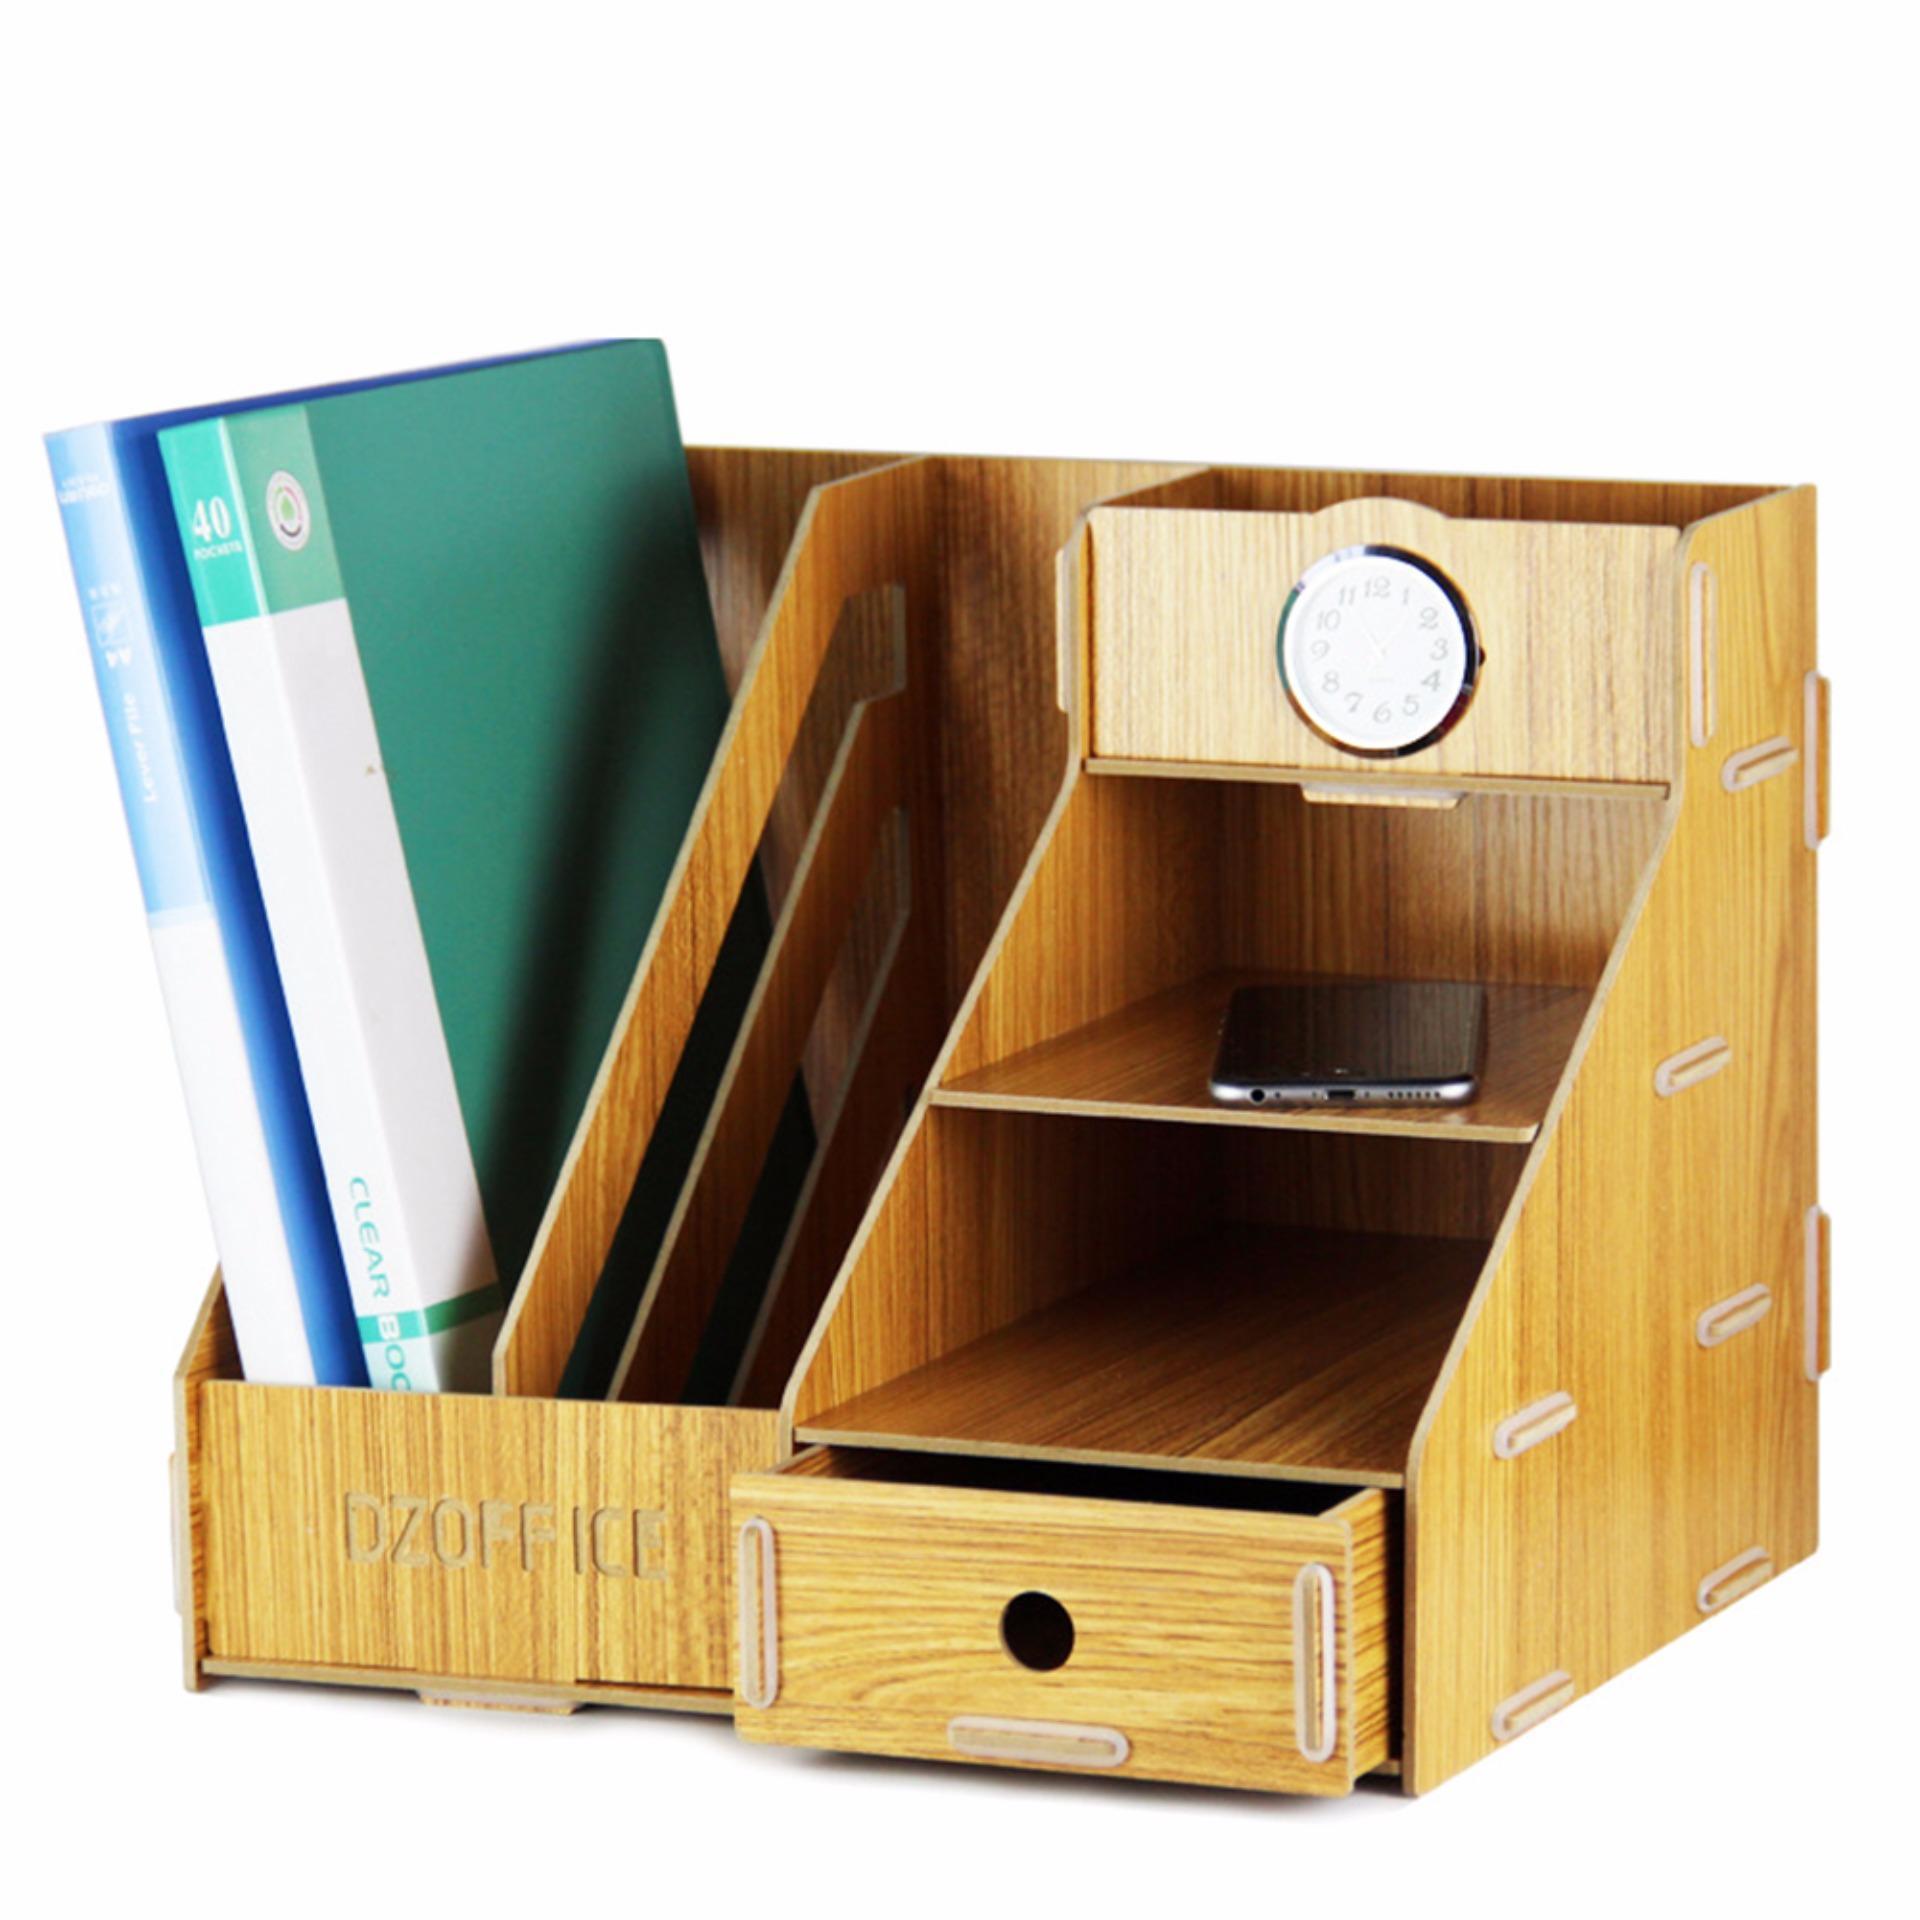 Detachable Wooden Grain Design Office Desk A4 File Rack Desktop Diyorganizer Shelf Book Storage Box